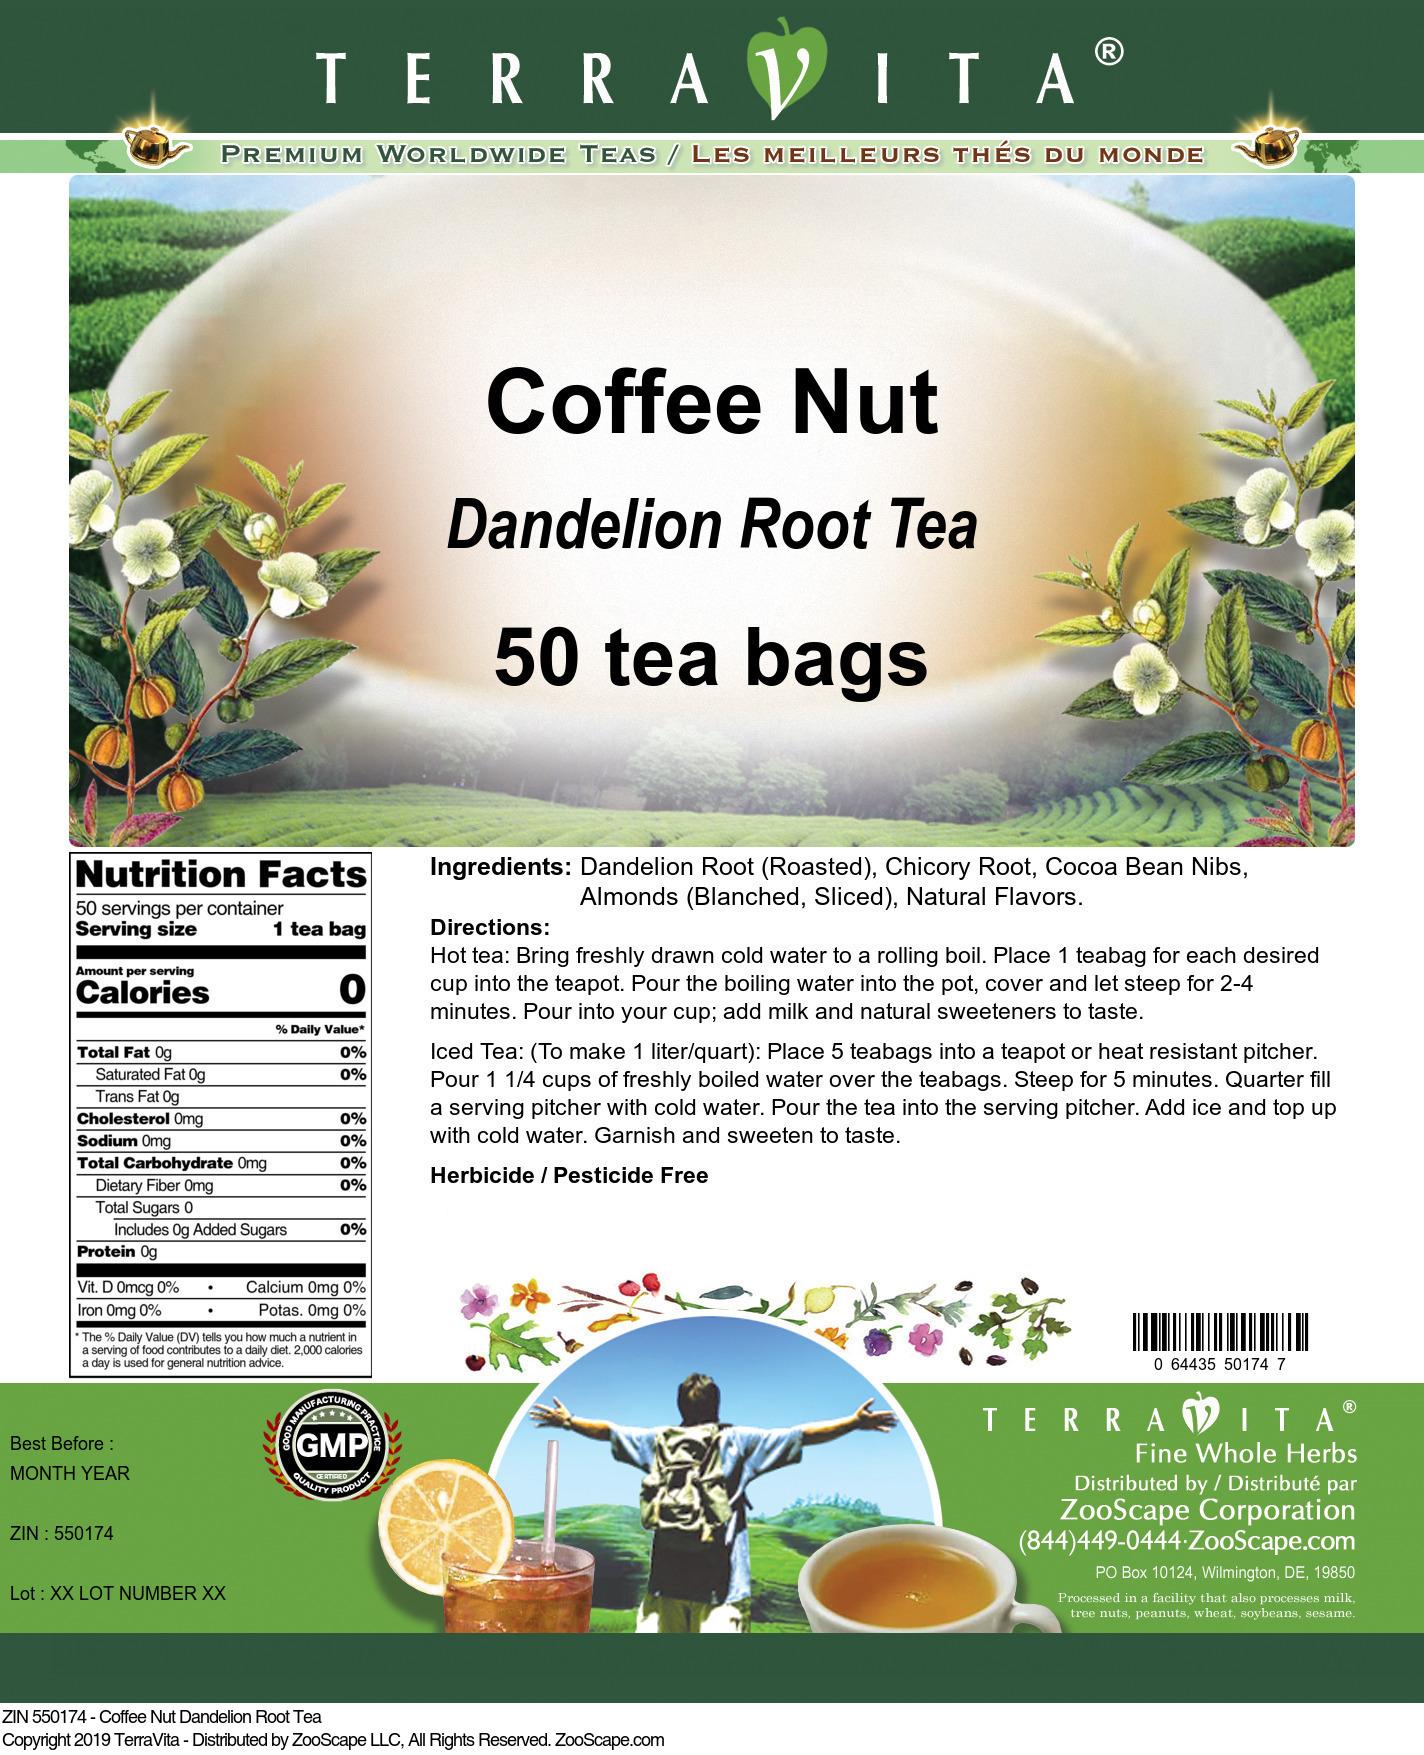 Coffee Nut Dandelion Root